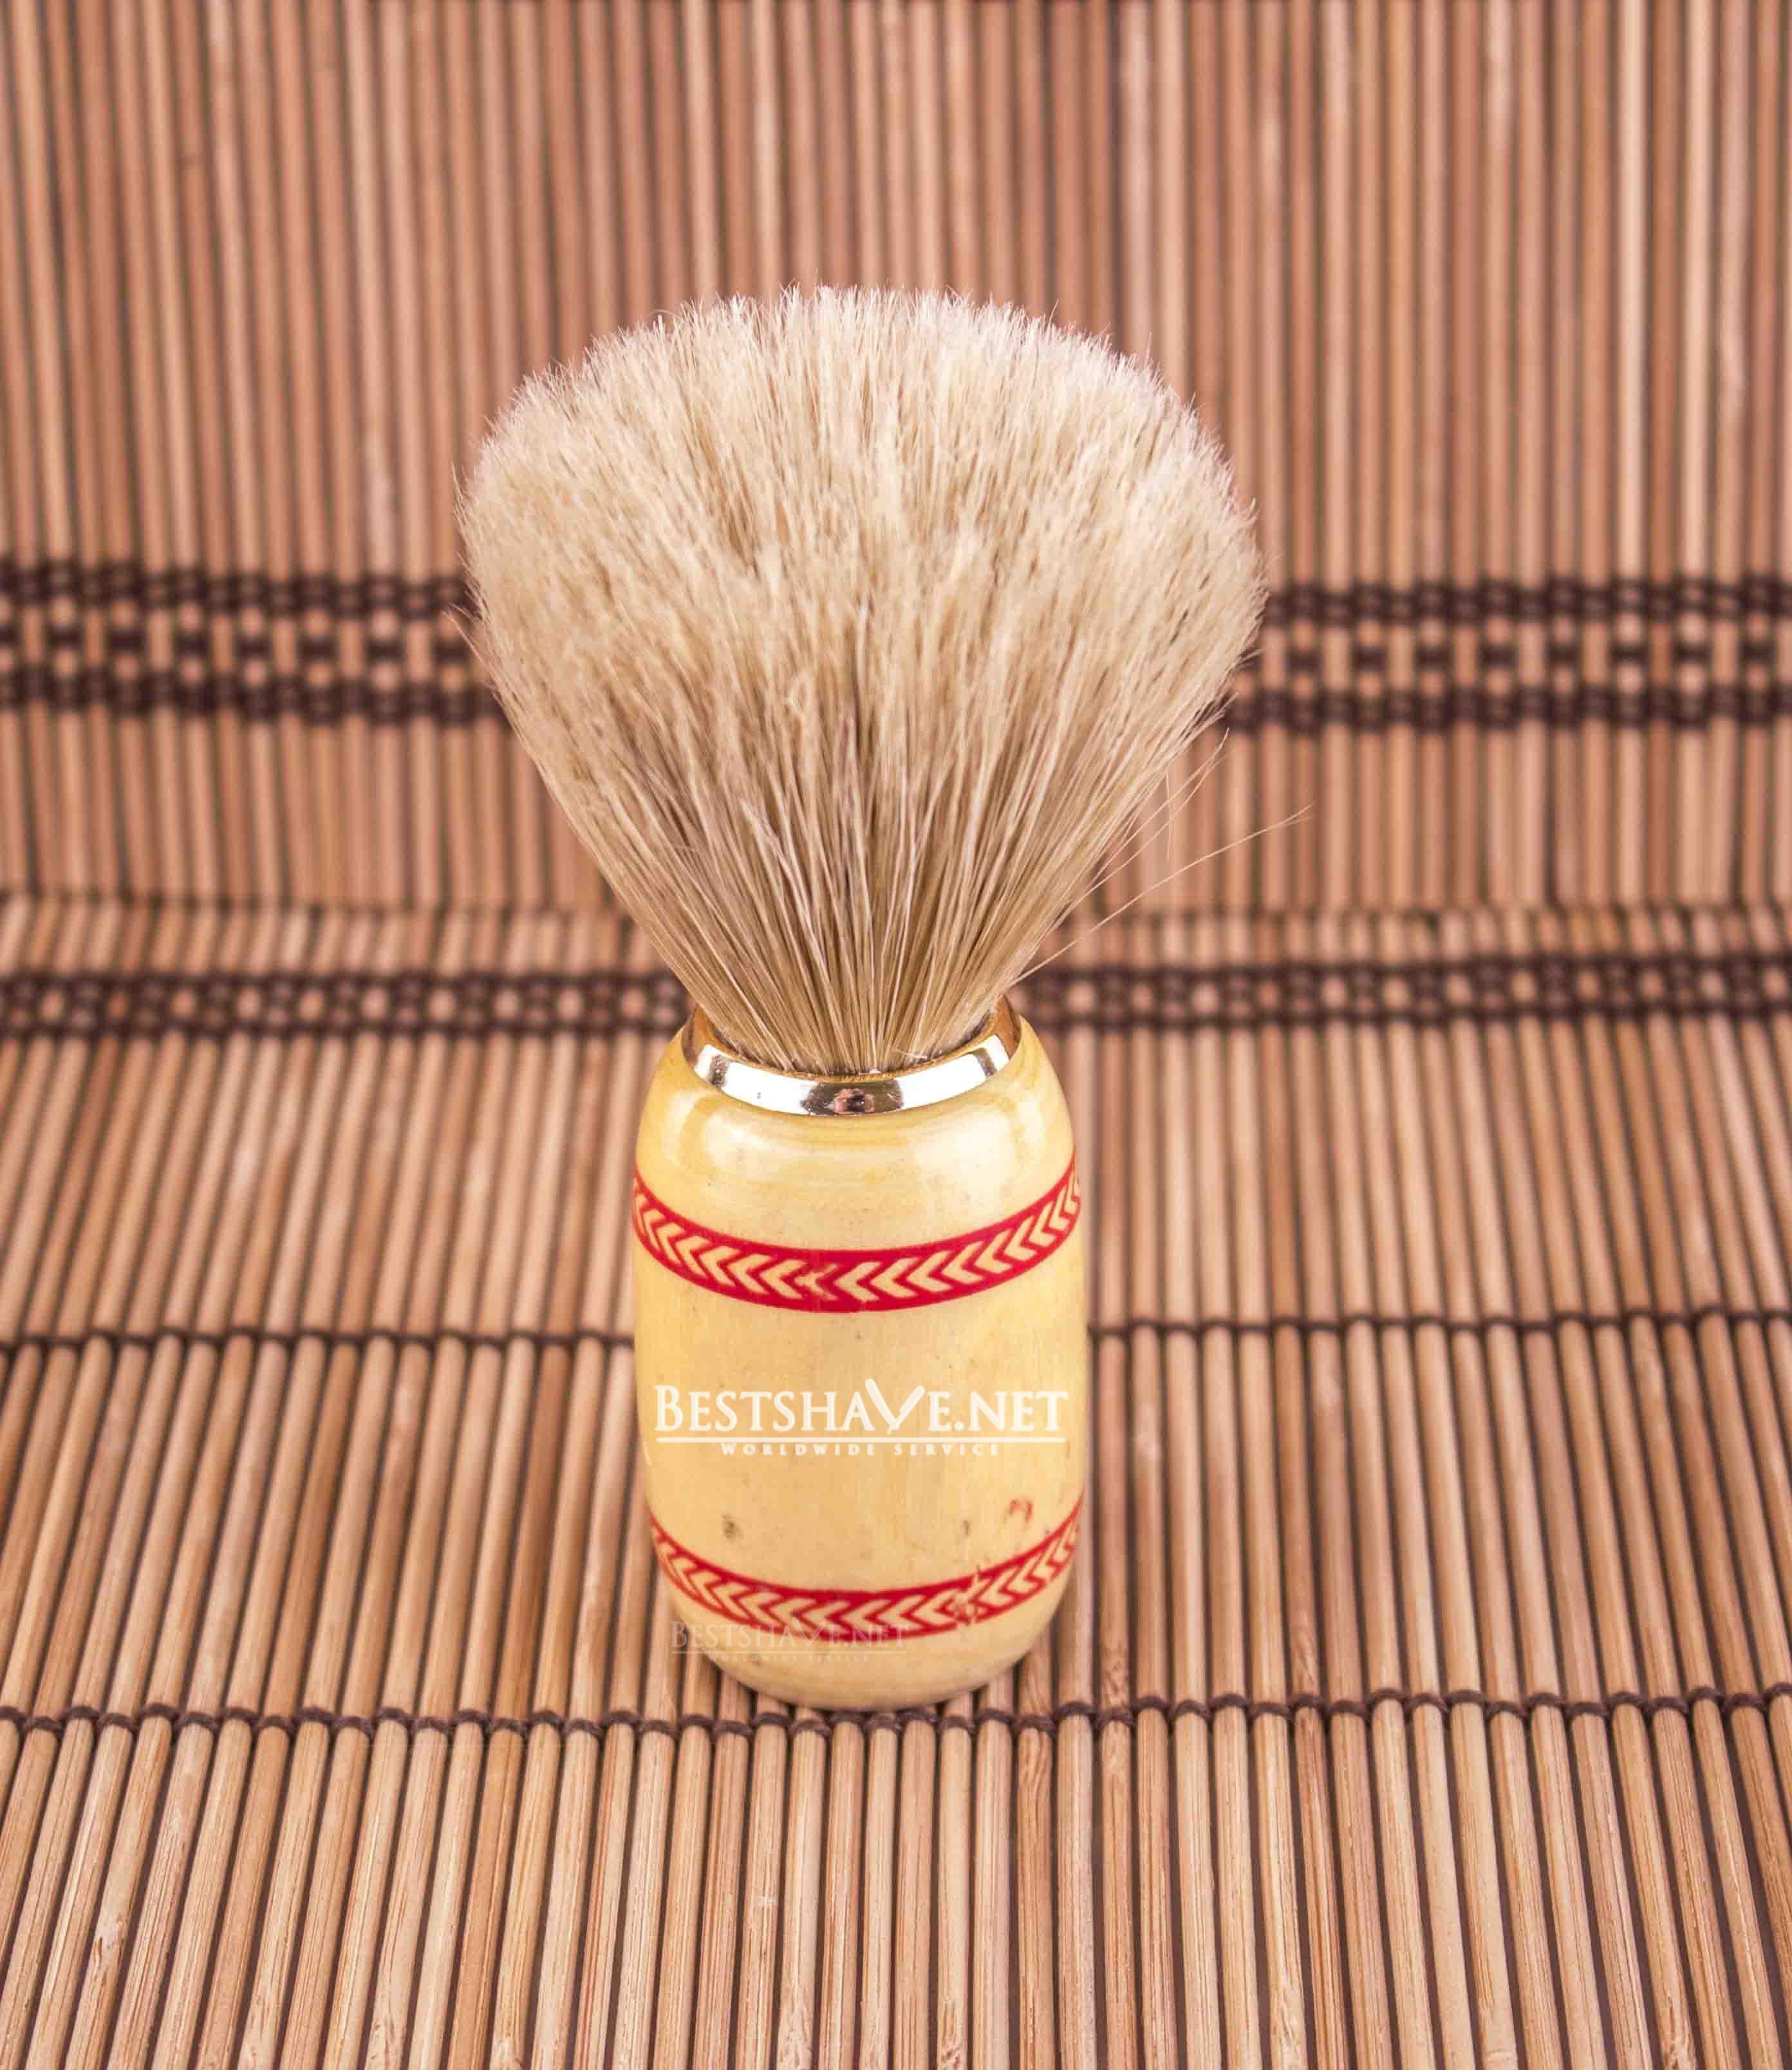 Bestshave Shaving Brushes No: 1